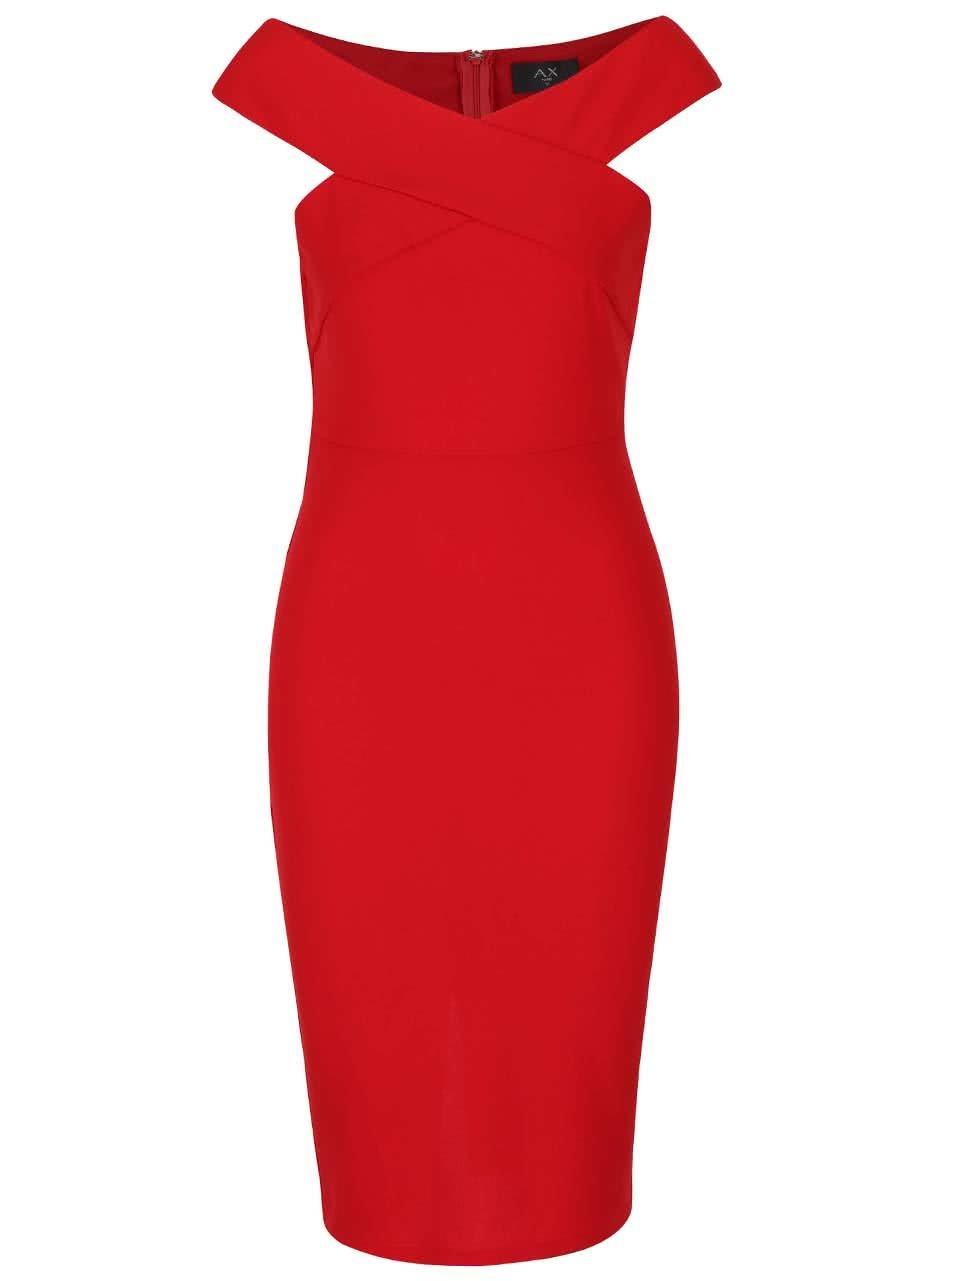 3c8cd9e2ee29 Červené priliehavé šaty AX Paris ...